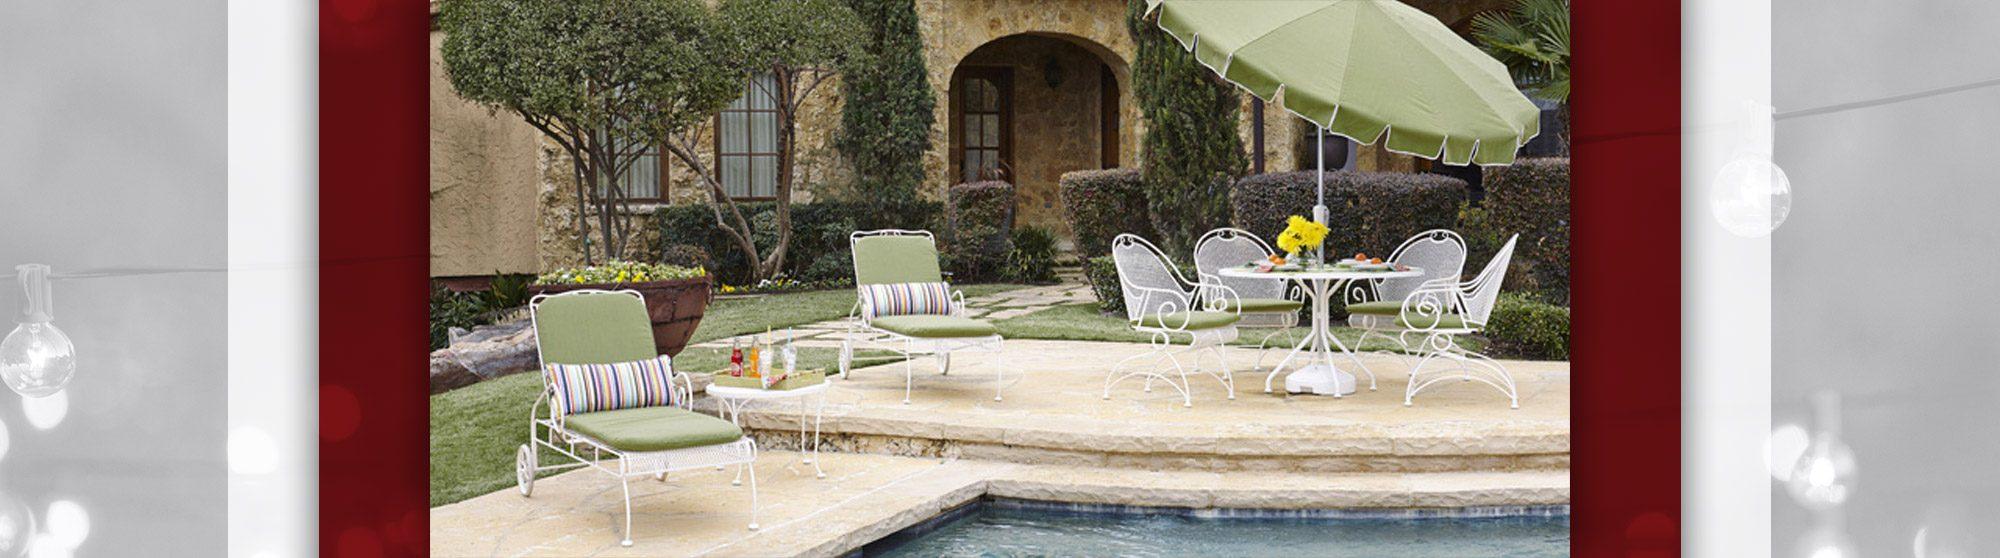 Outdoor Furniture Alpharetta Outdoor Wicker Furniture